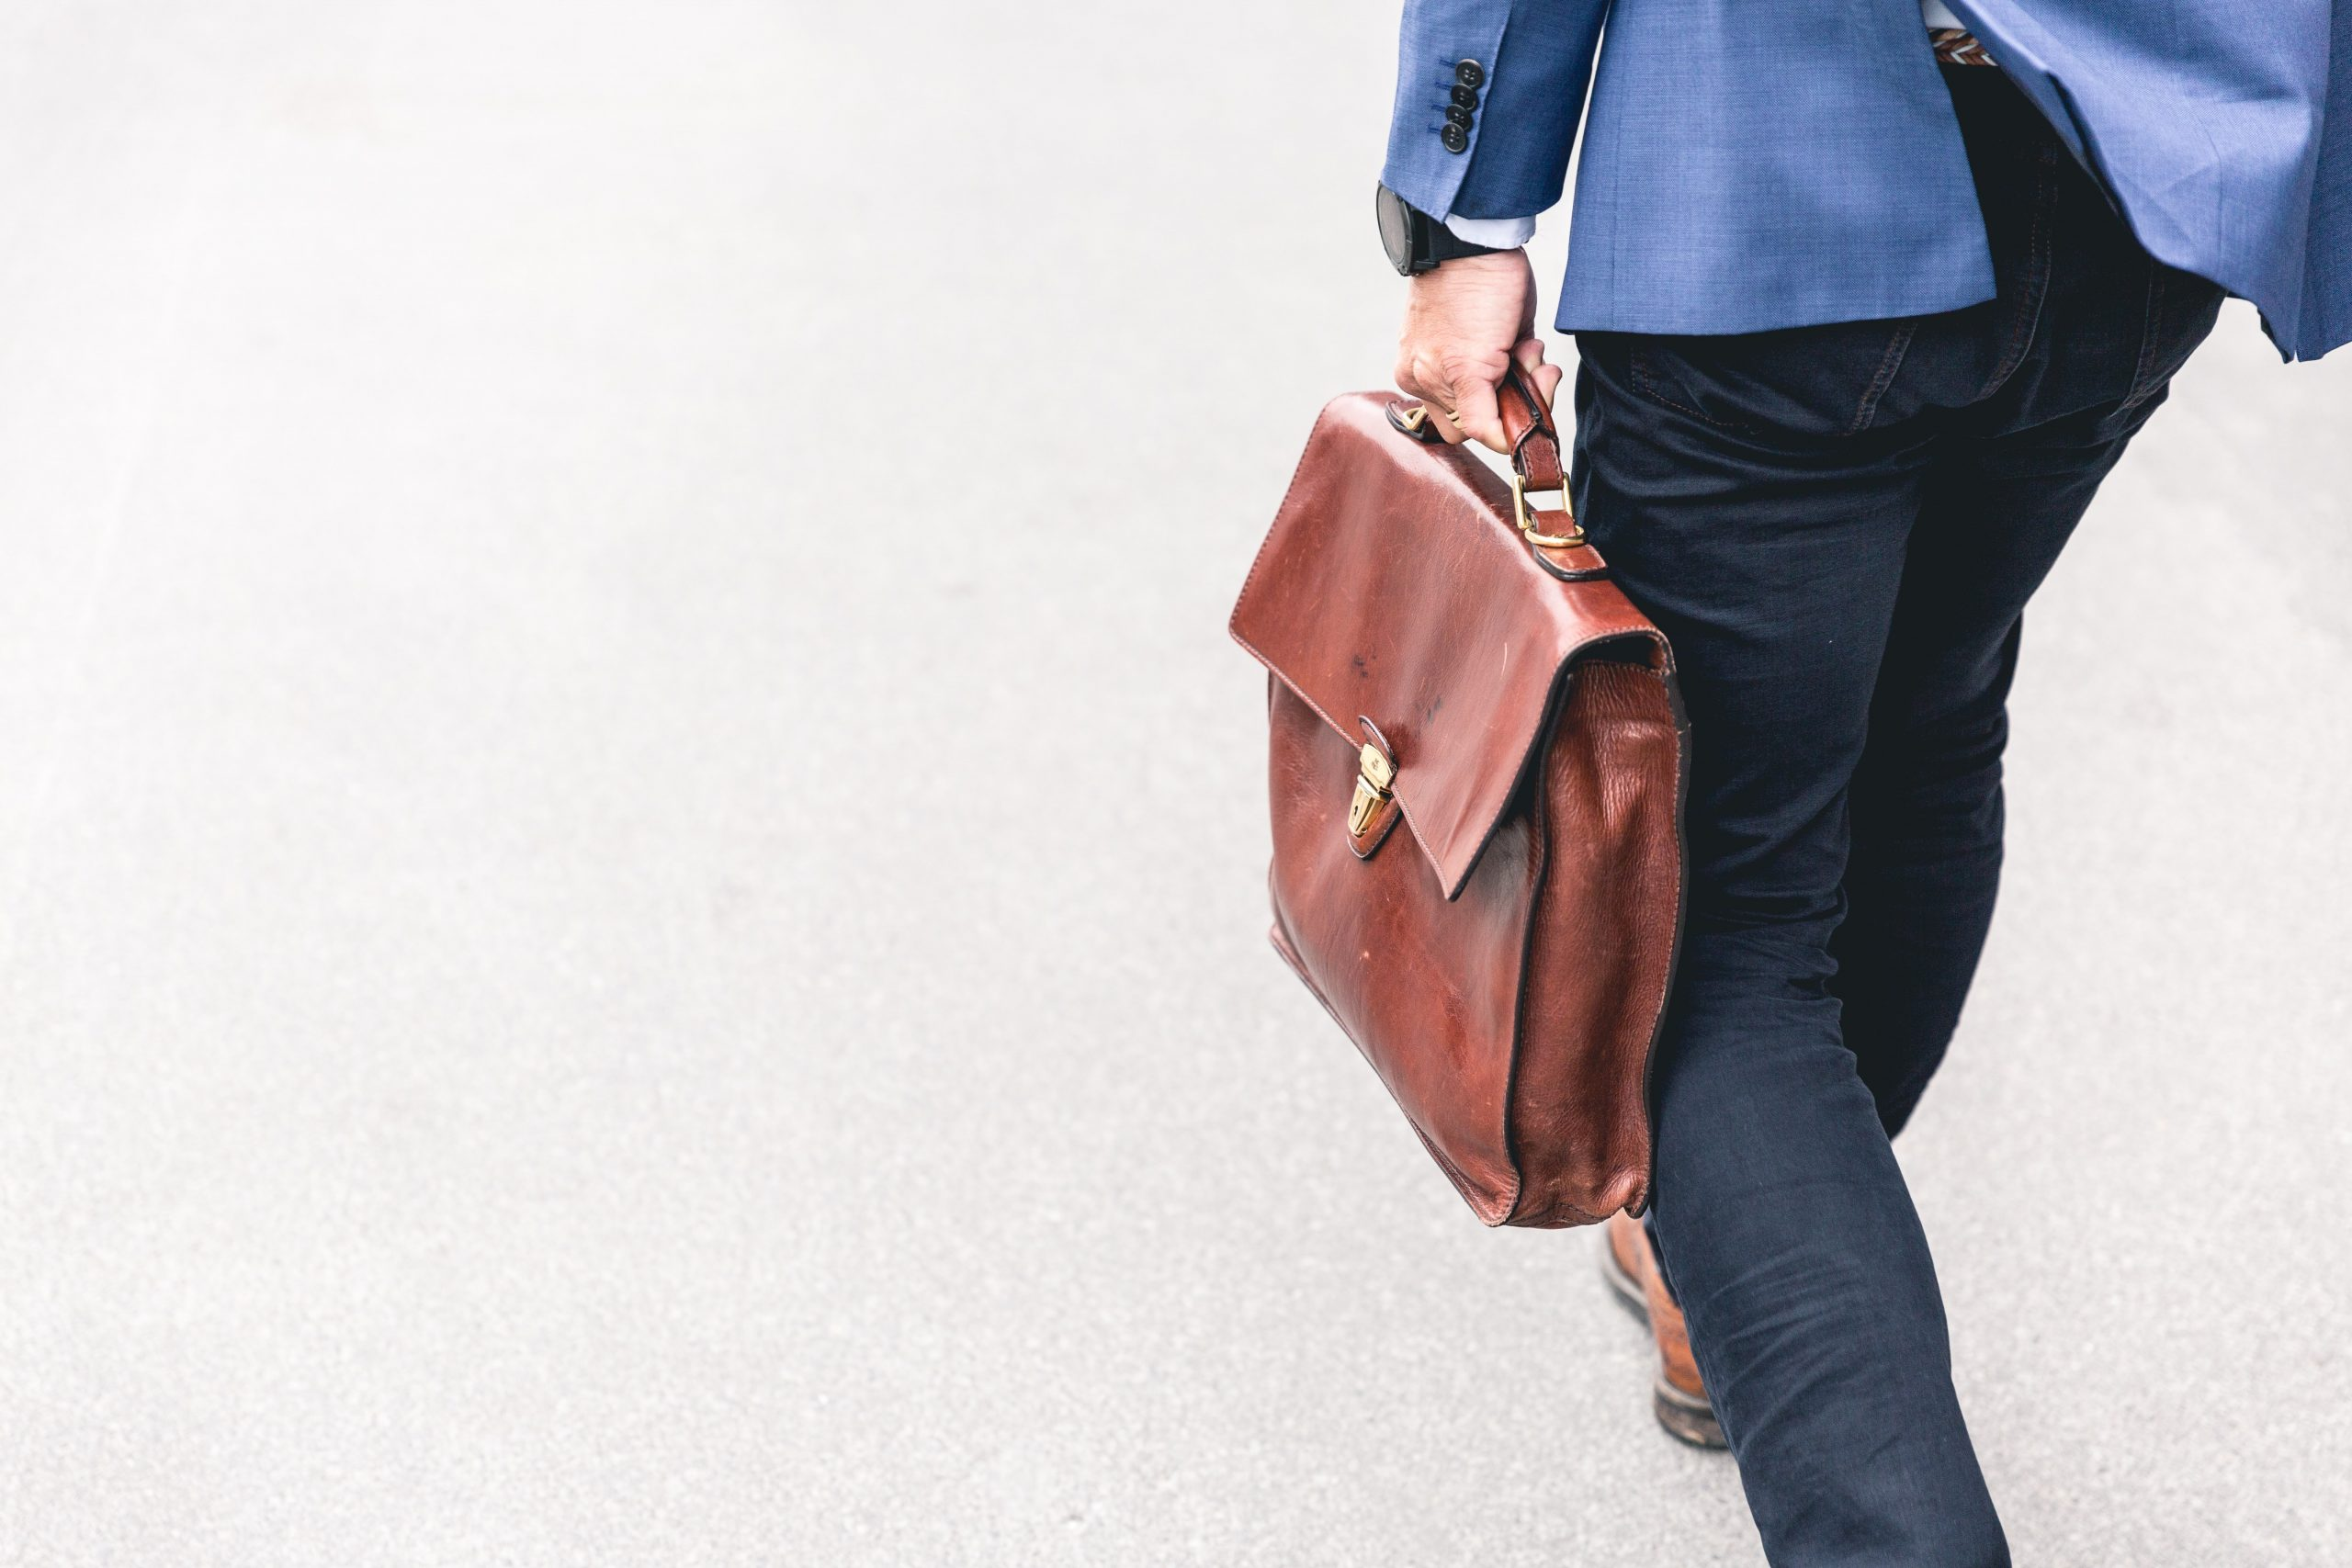 a man carrying a brown bag